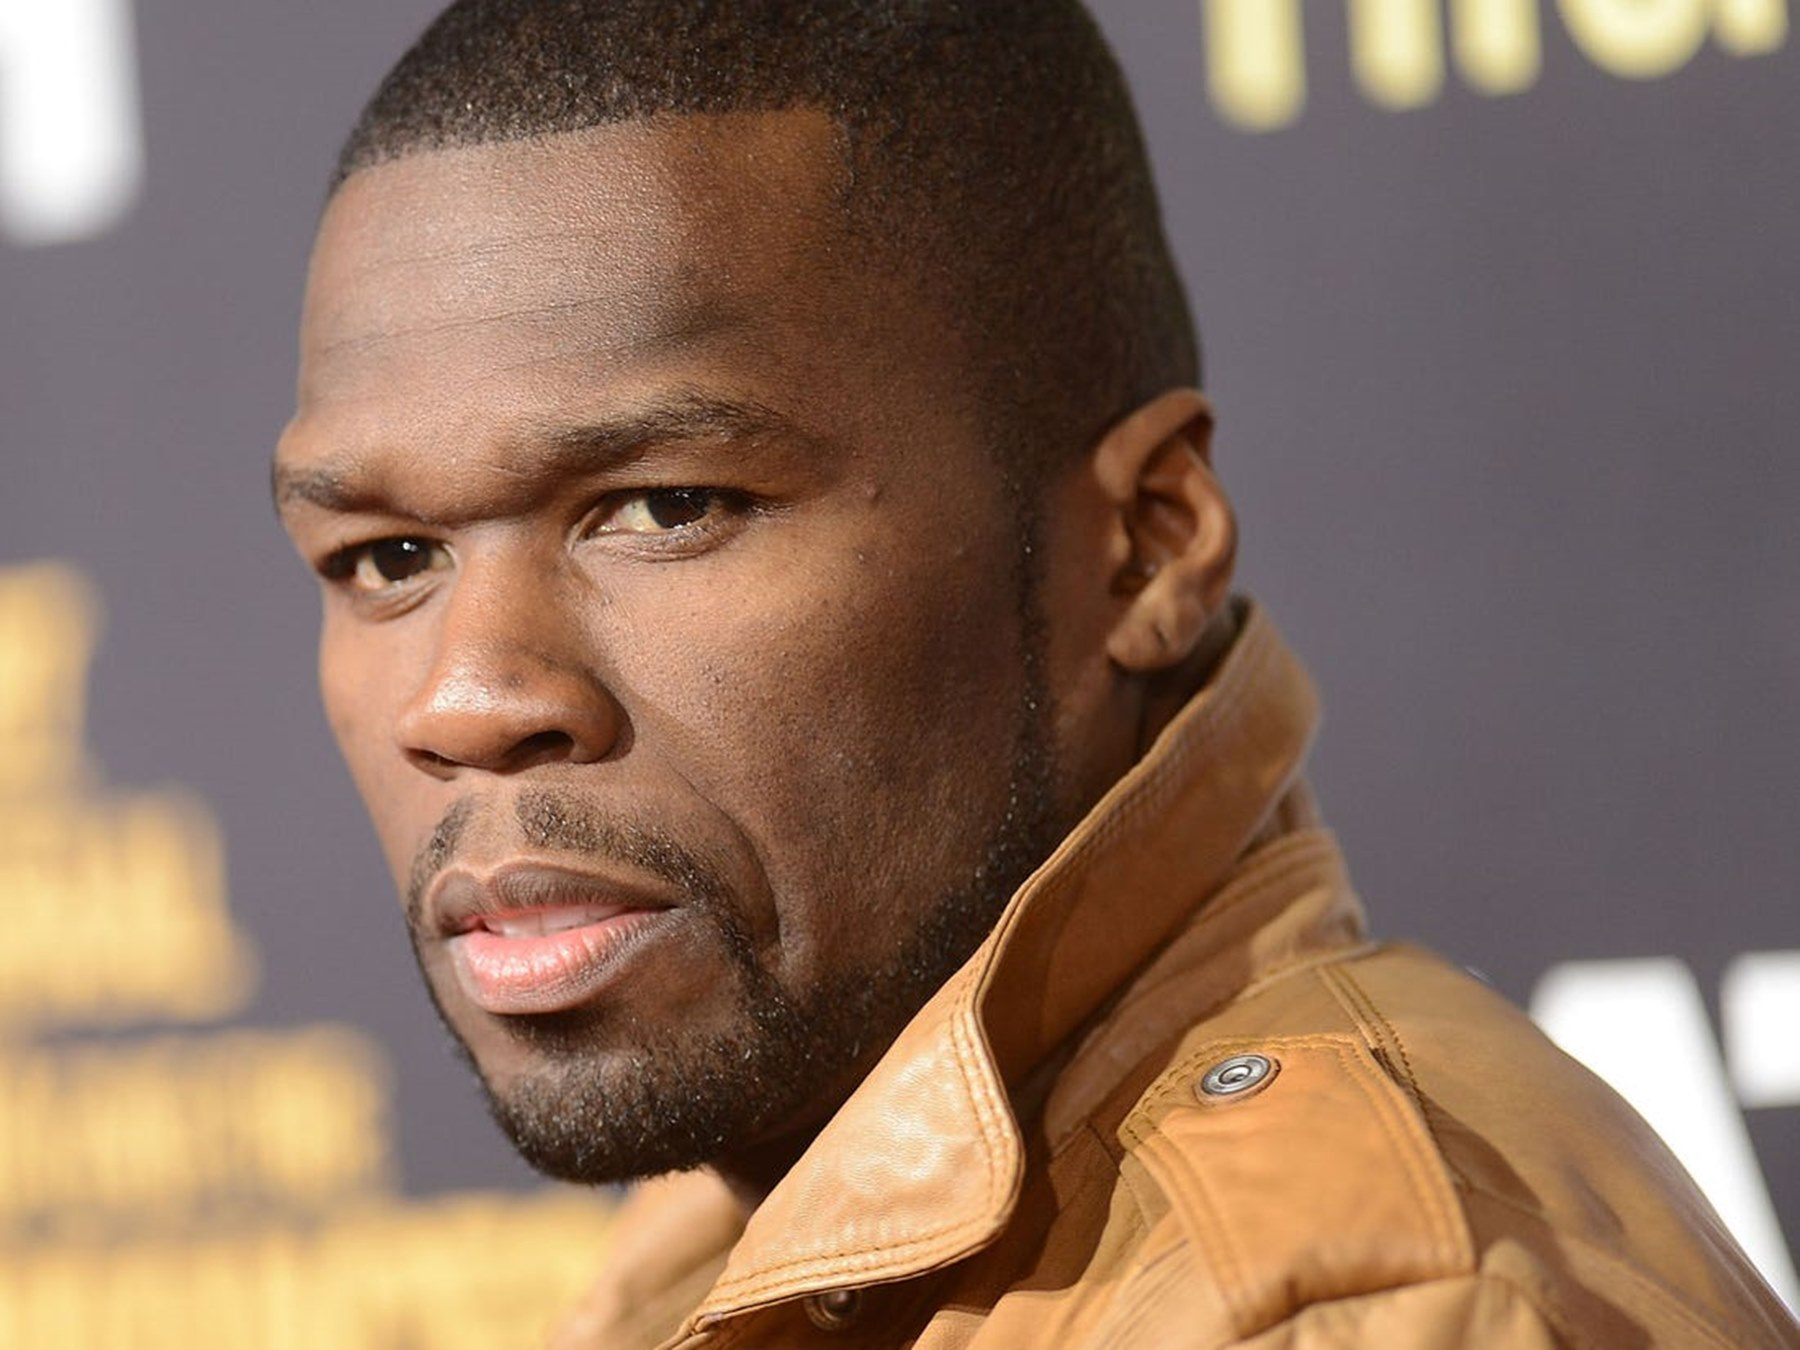 50 Cent Gender-Neutral Bathroom Drama